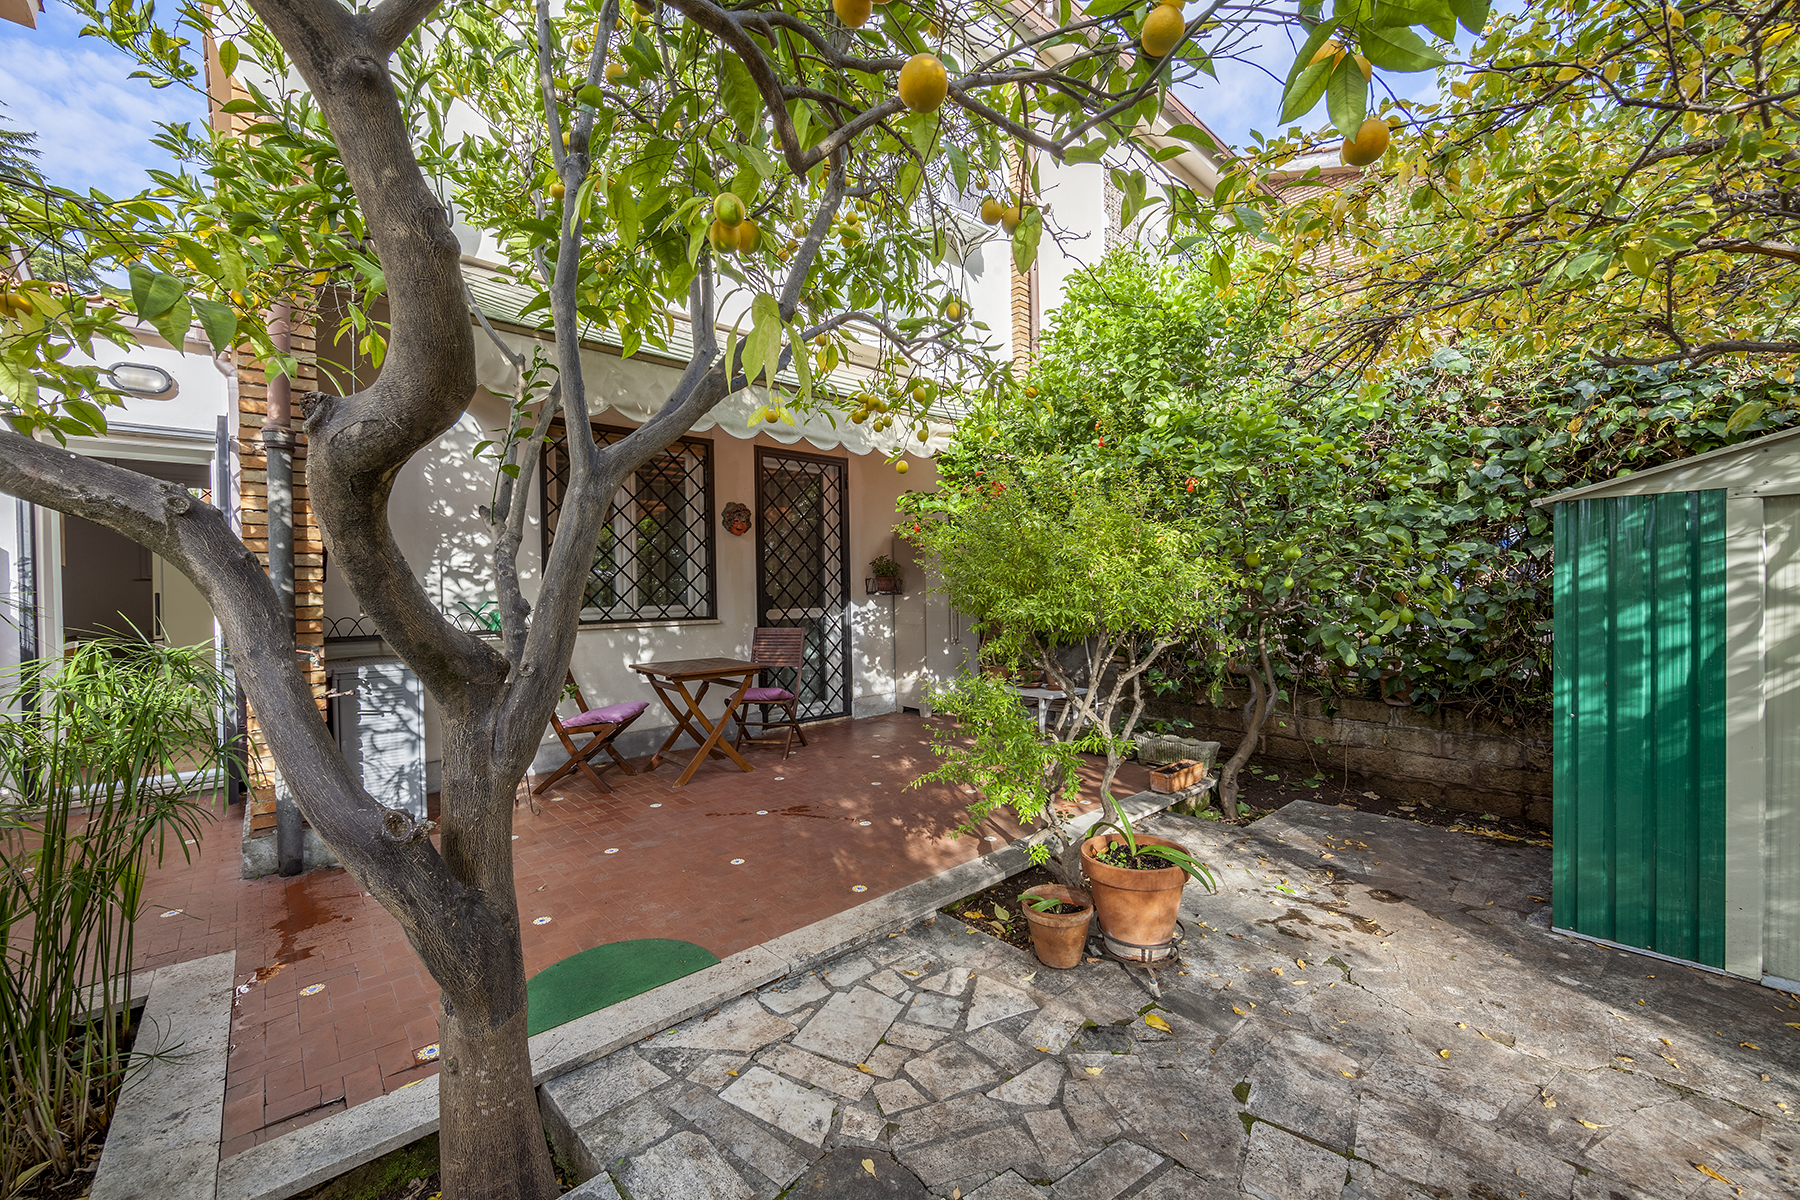 Casa indipendente in Vendita a Roma 23 Eur / Torrino: 4 locali, 90 mq